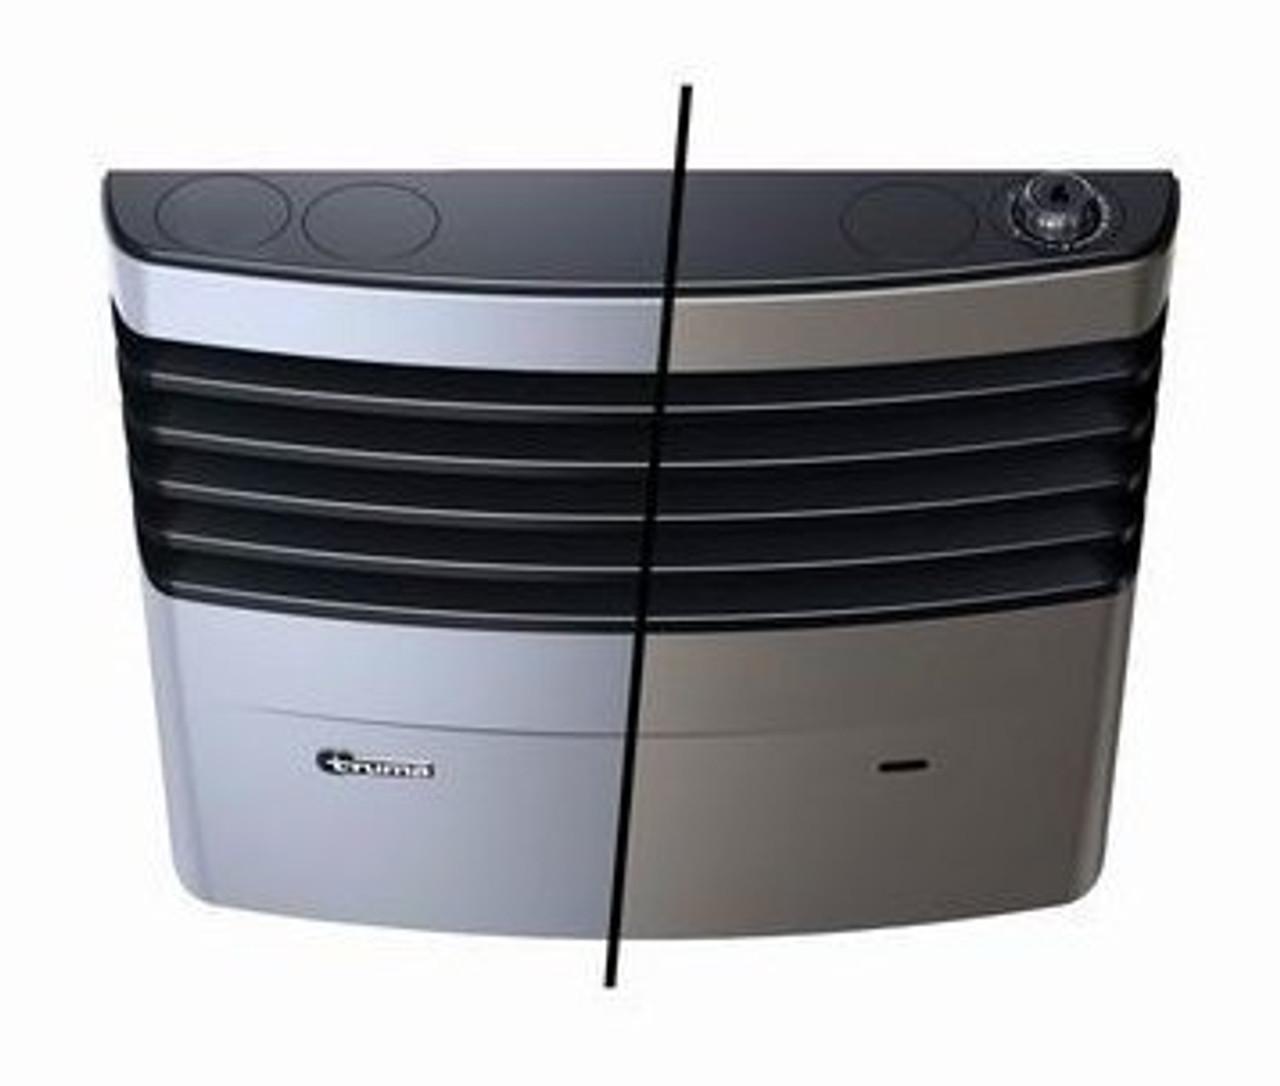 Truma S3004 Caravan & Motorhome Gas Heater front cover colour options